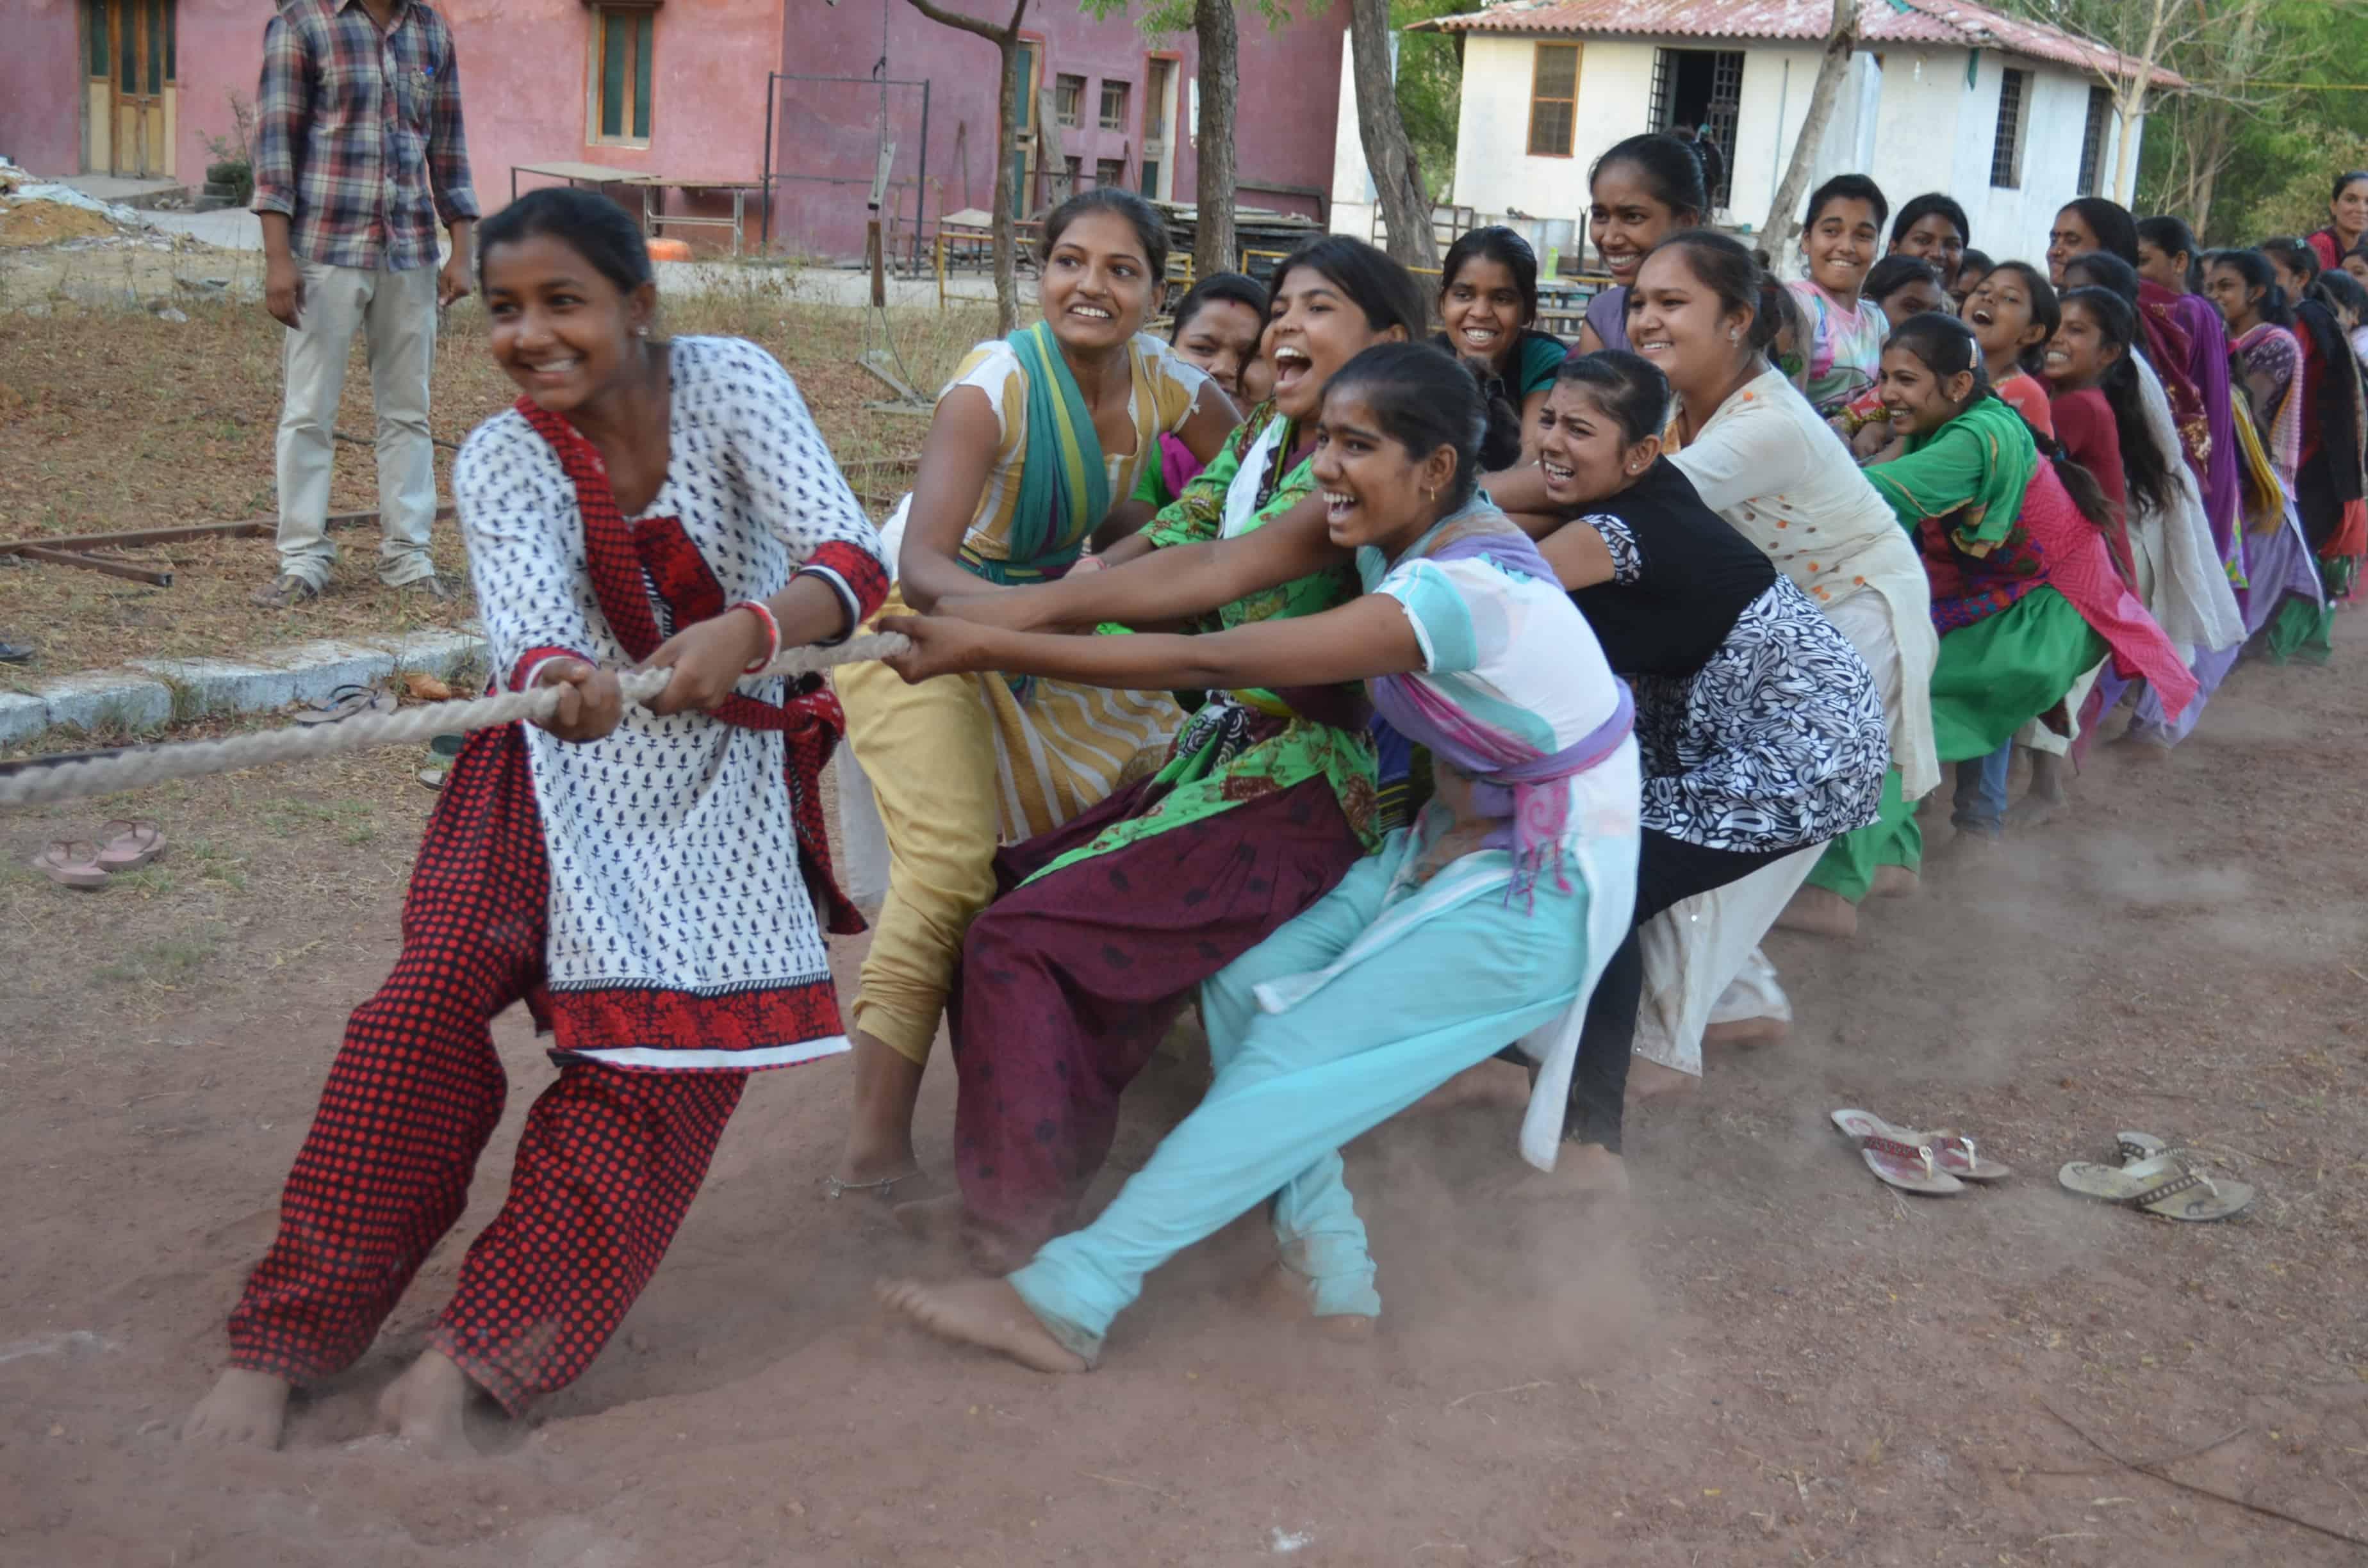 Archive-India-DalitFoundation-2